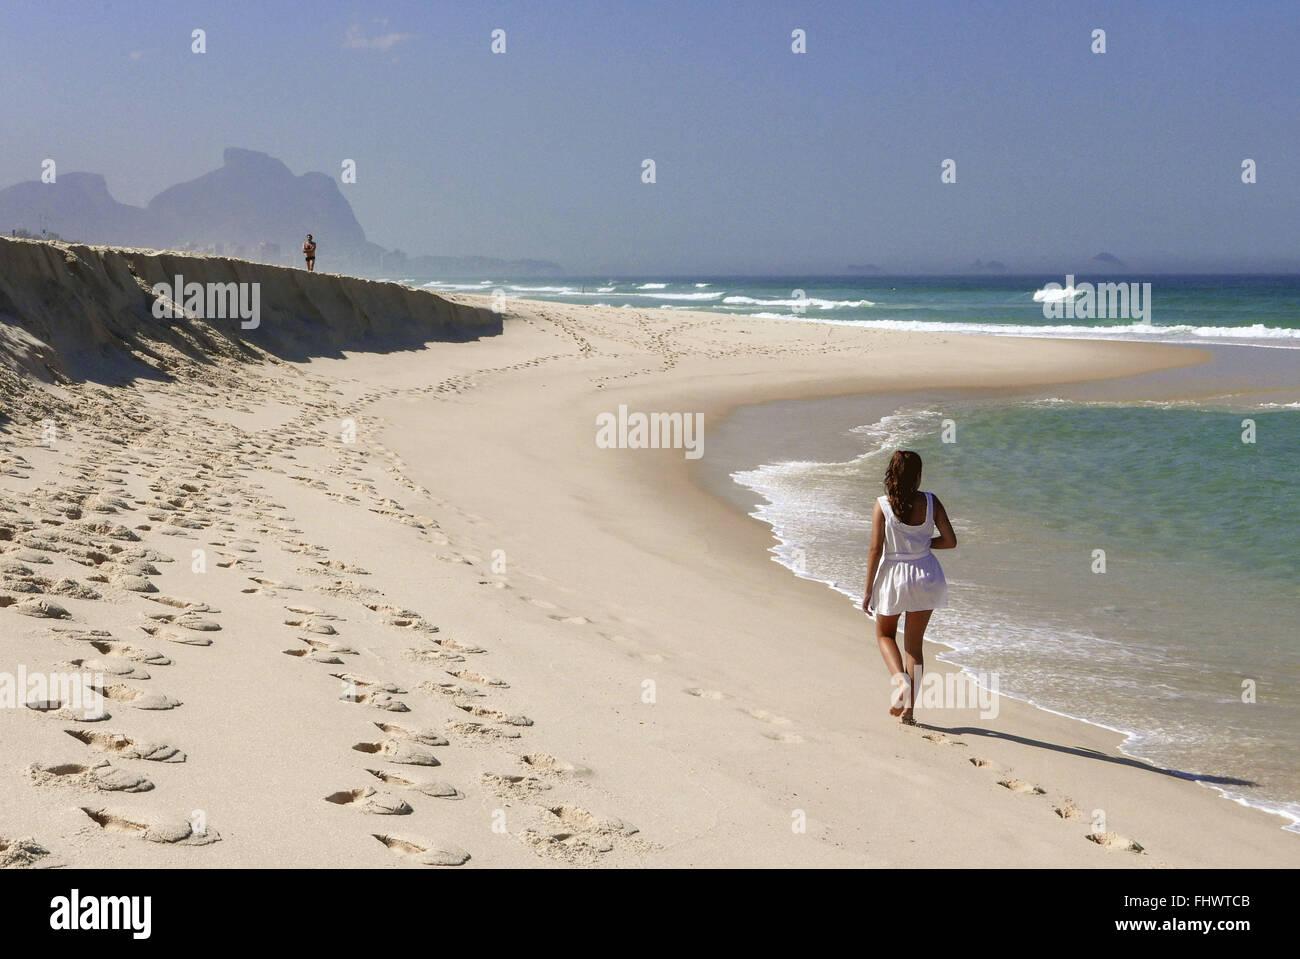 Adolescente Caminhando [Cheminant] na Praia da Reserva na Barra da Tijuca Photo Stock